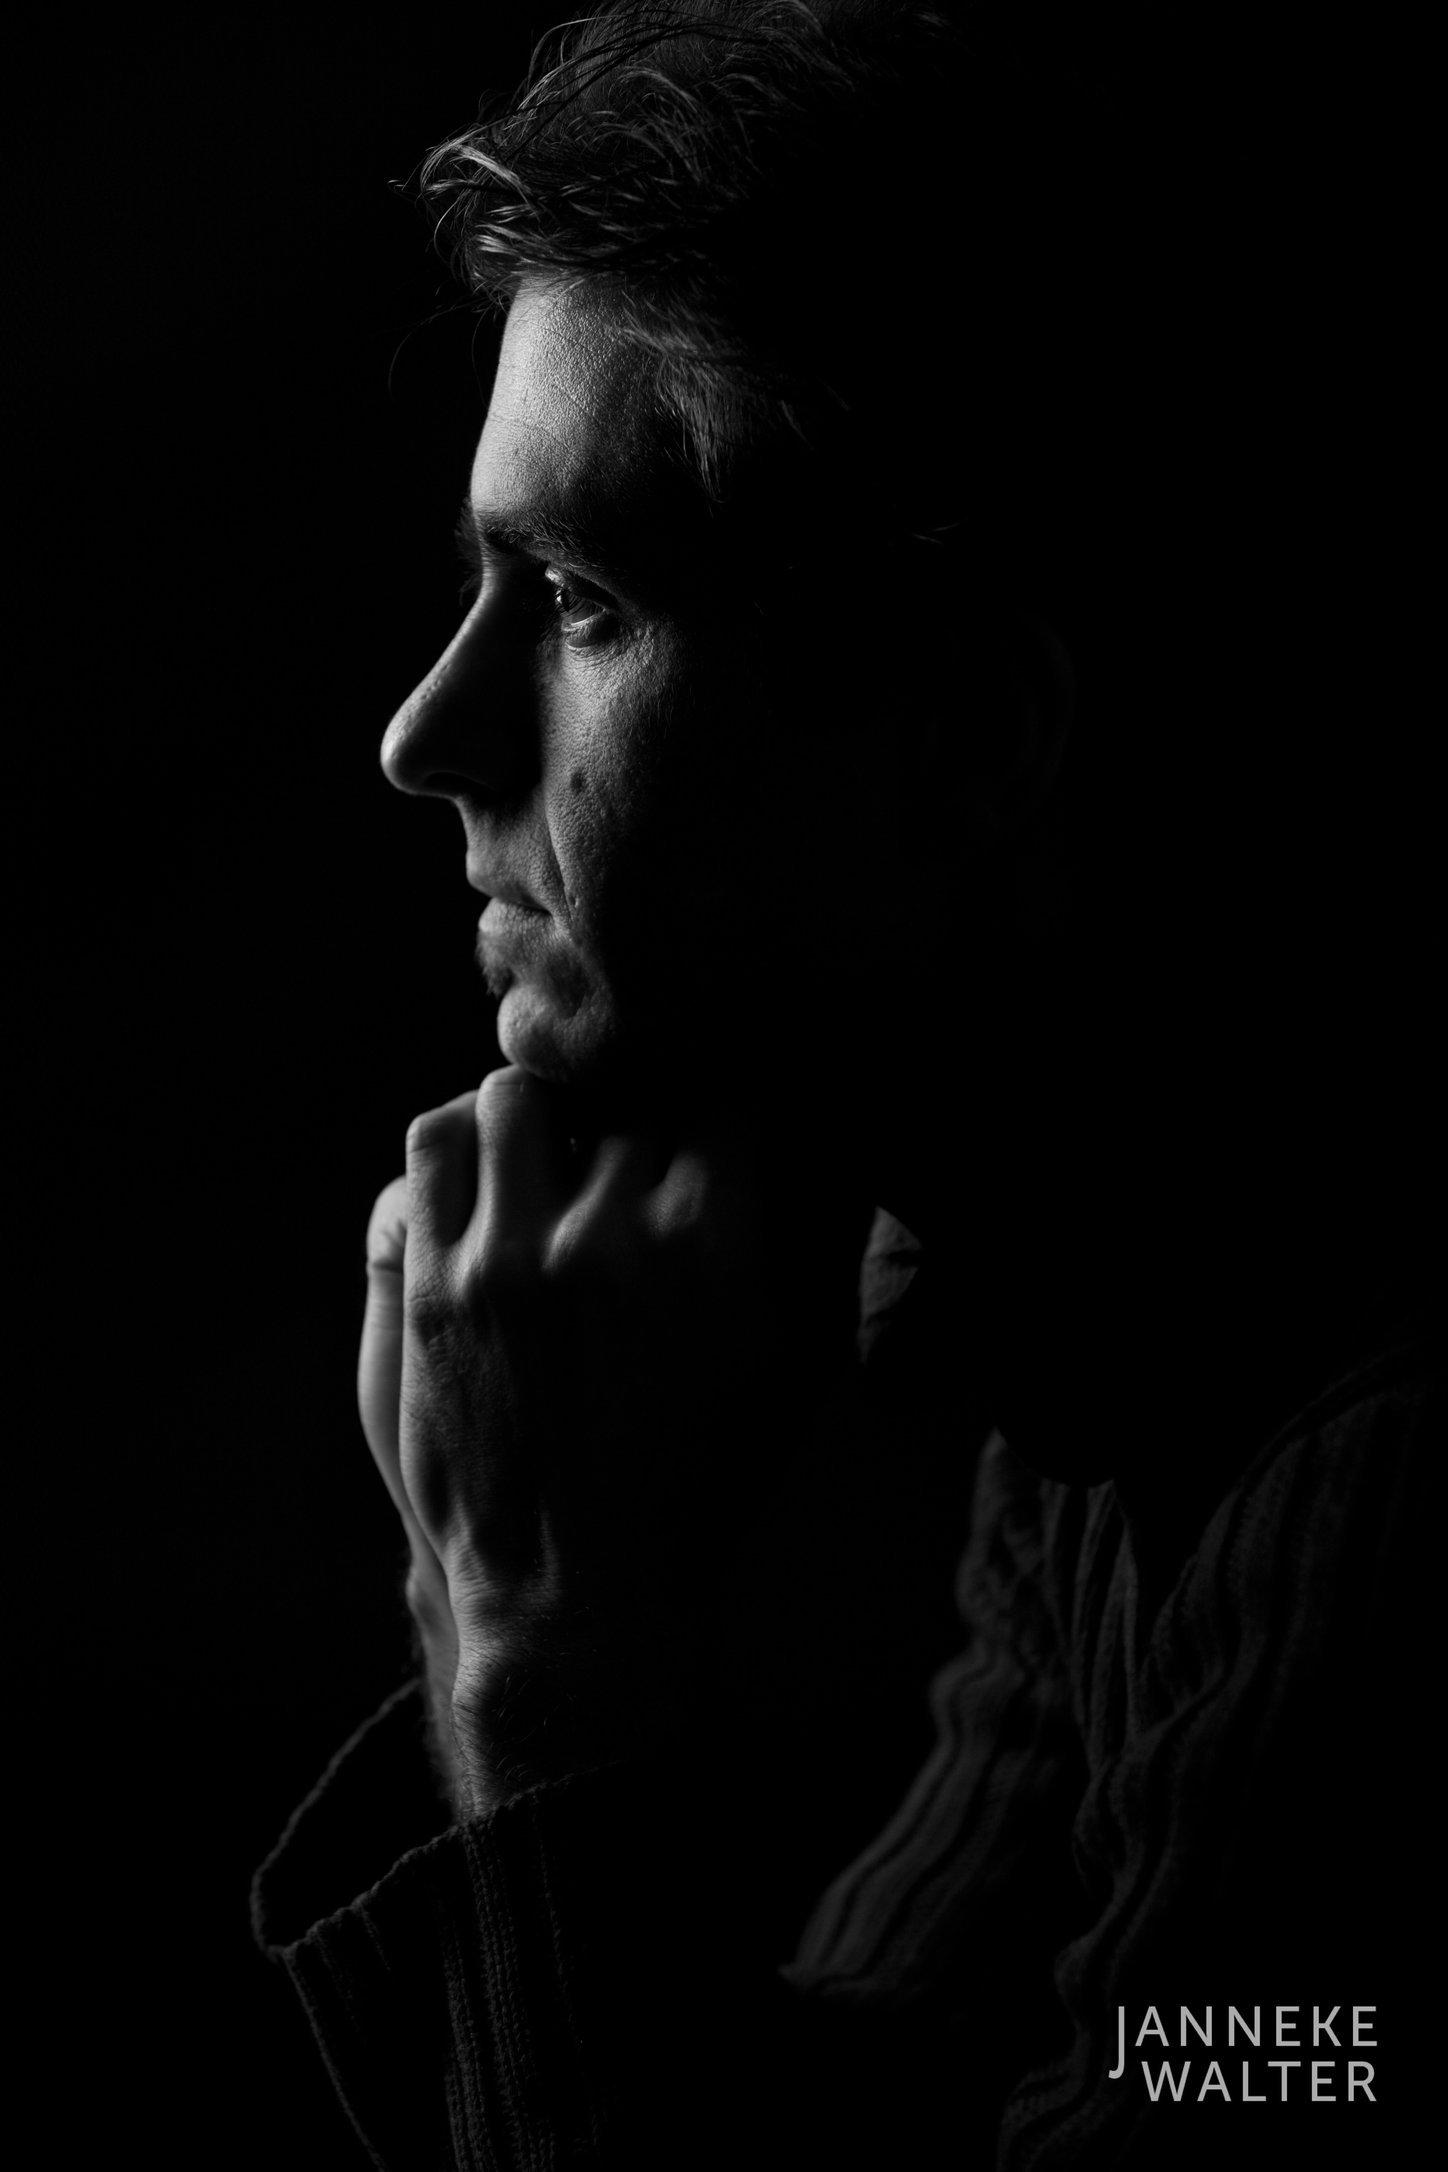 portretfoto man en profile © Janneke Walter, fotograaf Utrecht De Bilt, portretfotograaf, portret, portretfotografie